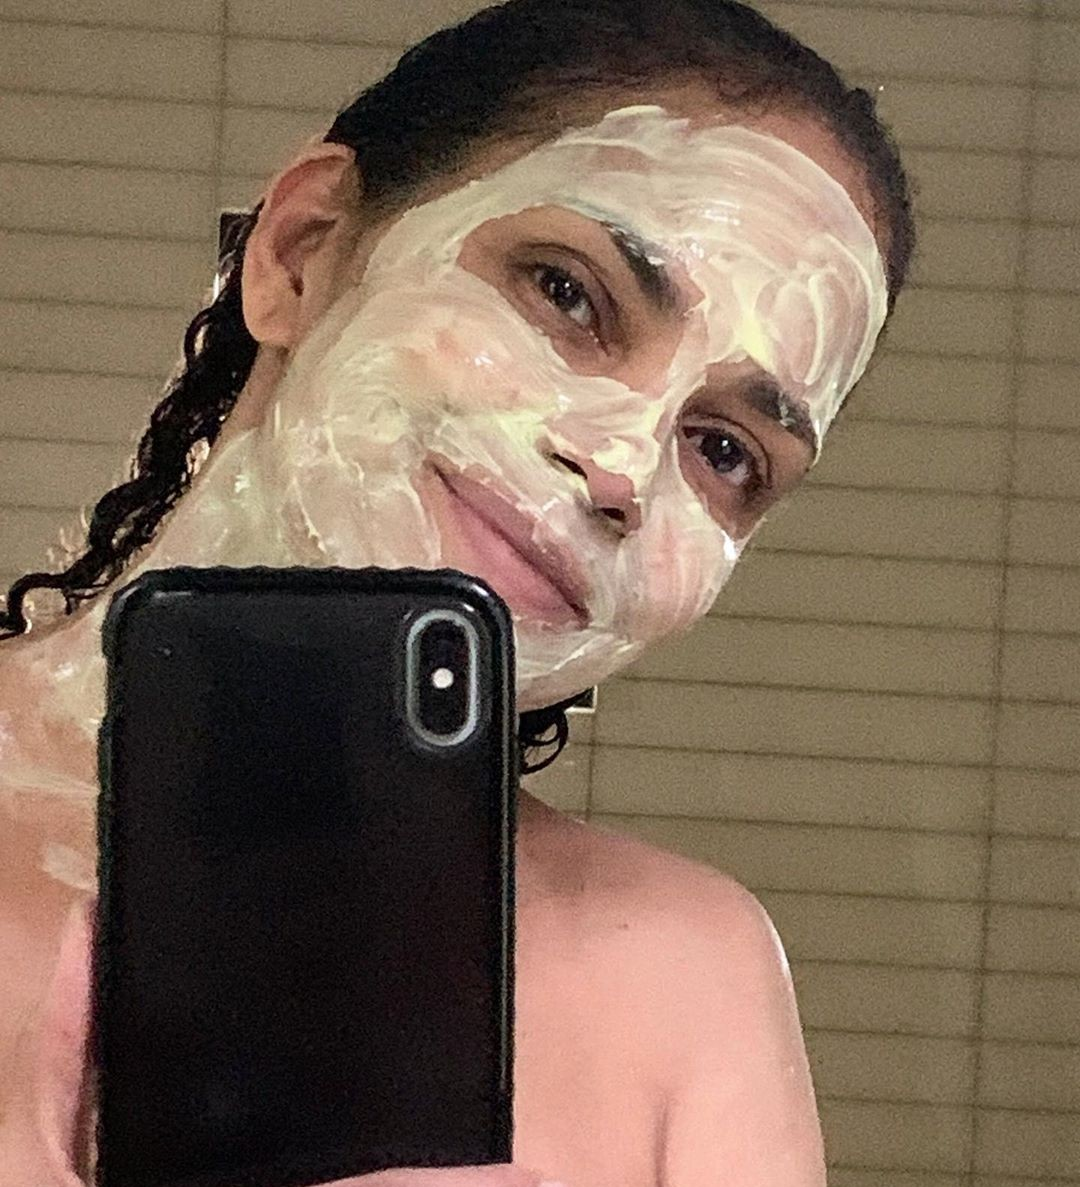 Hally Berry: Δίνει τη συνταγή για την αγαπημένη της DIY μάσκα προσώπου